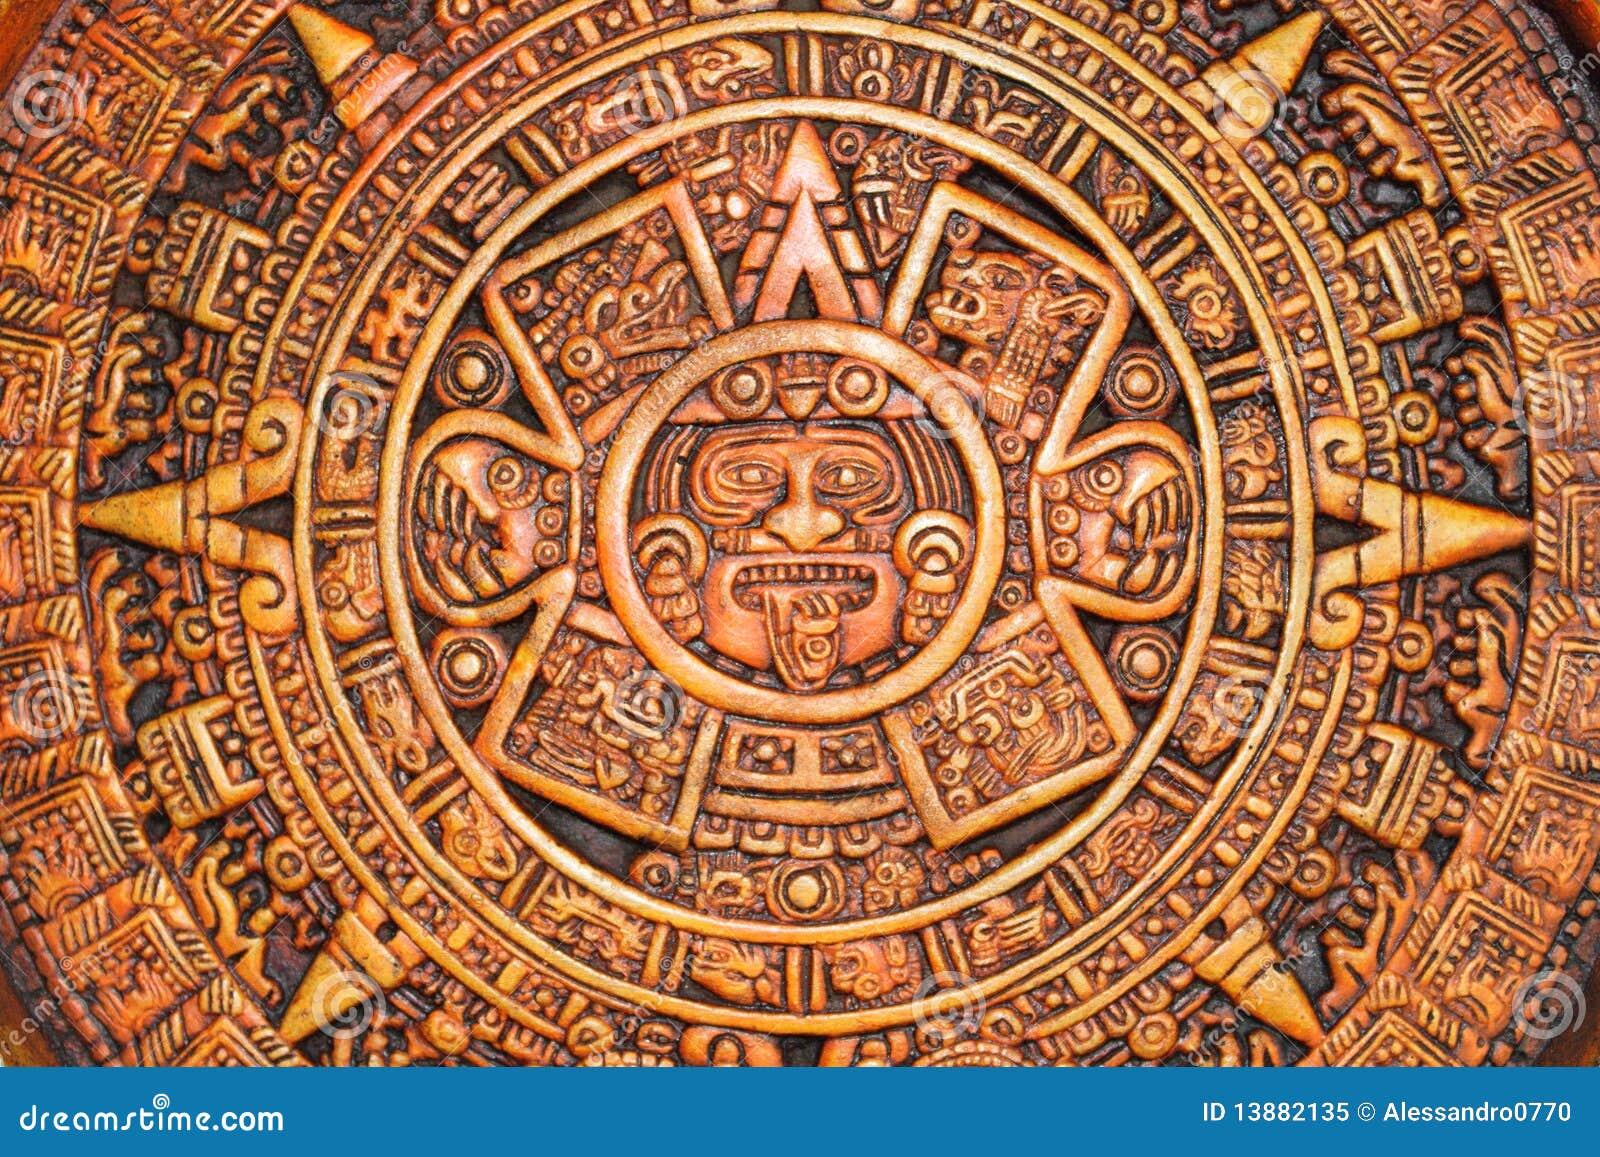 Aztec Calendar Royalty Free Stock Photo - Image: 13882135